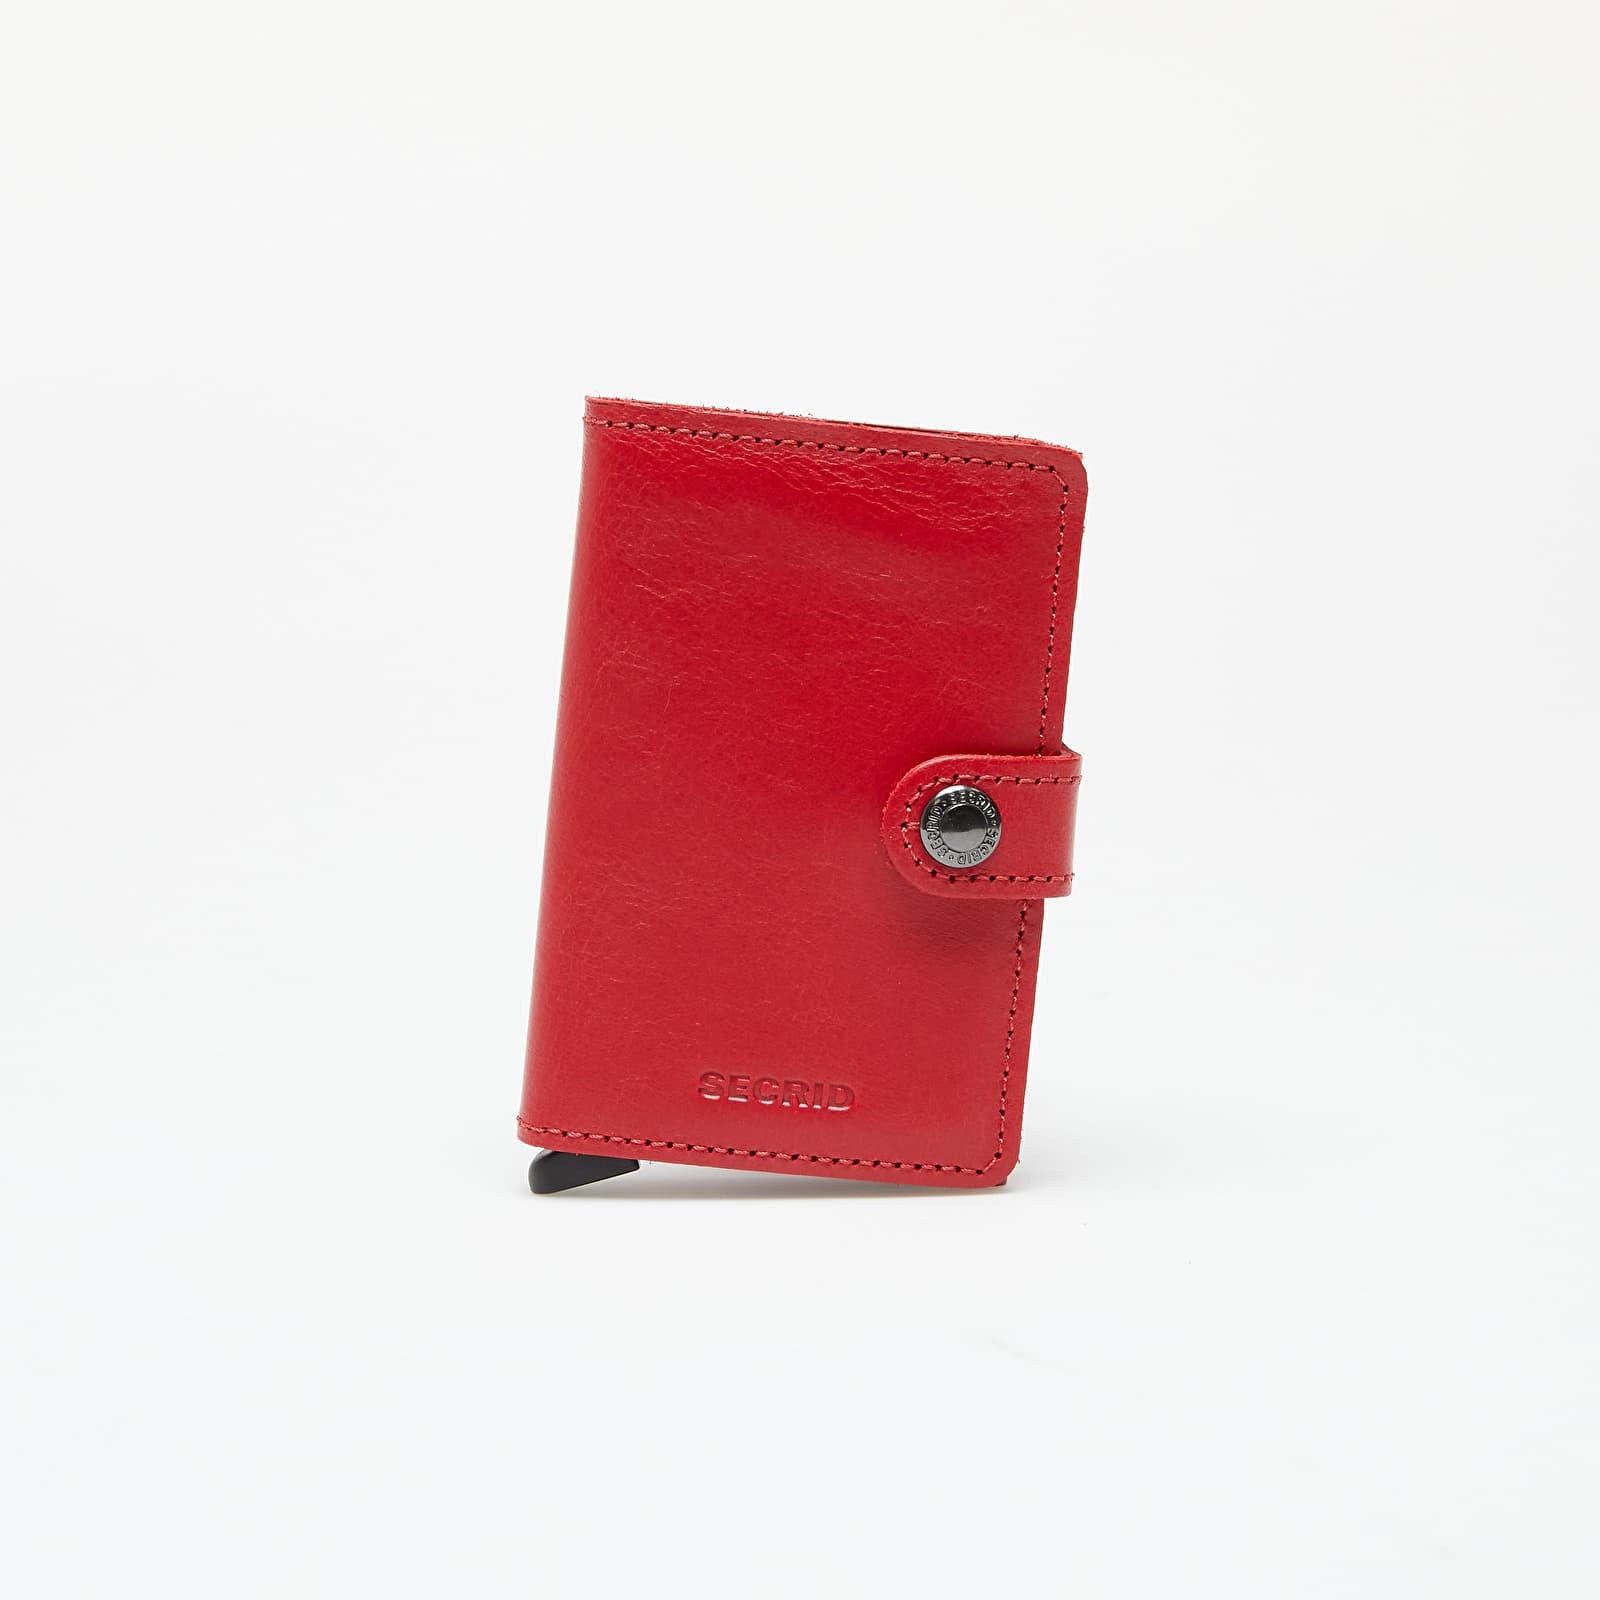 Portafogli Secrid Miniwallet Original Red-Red